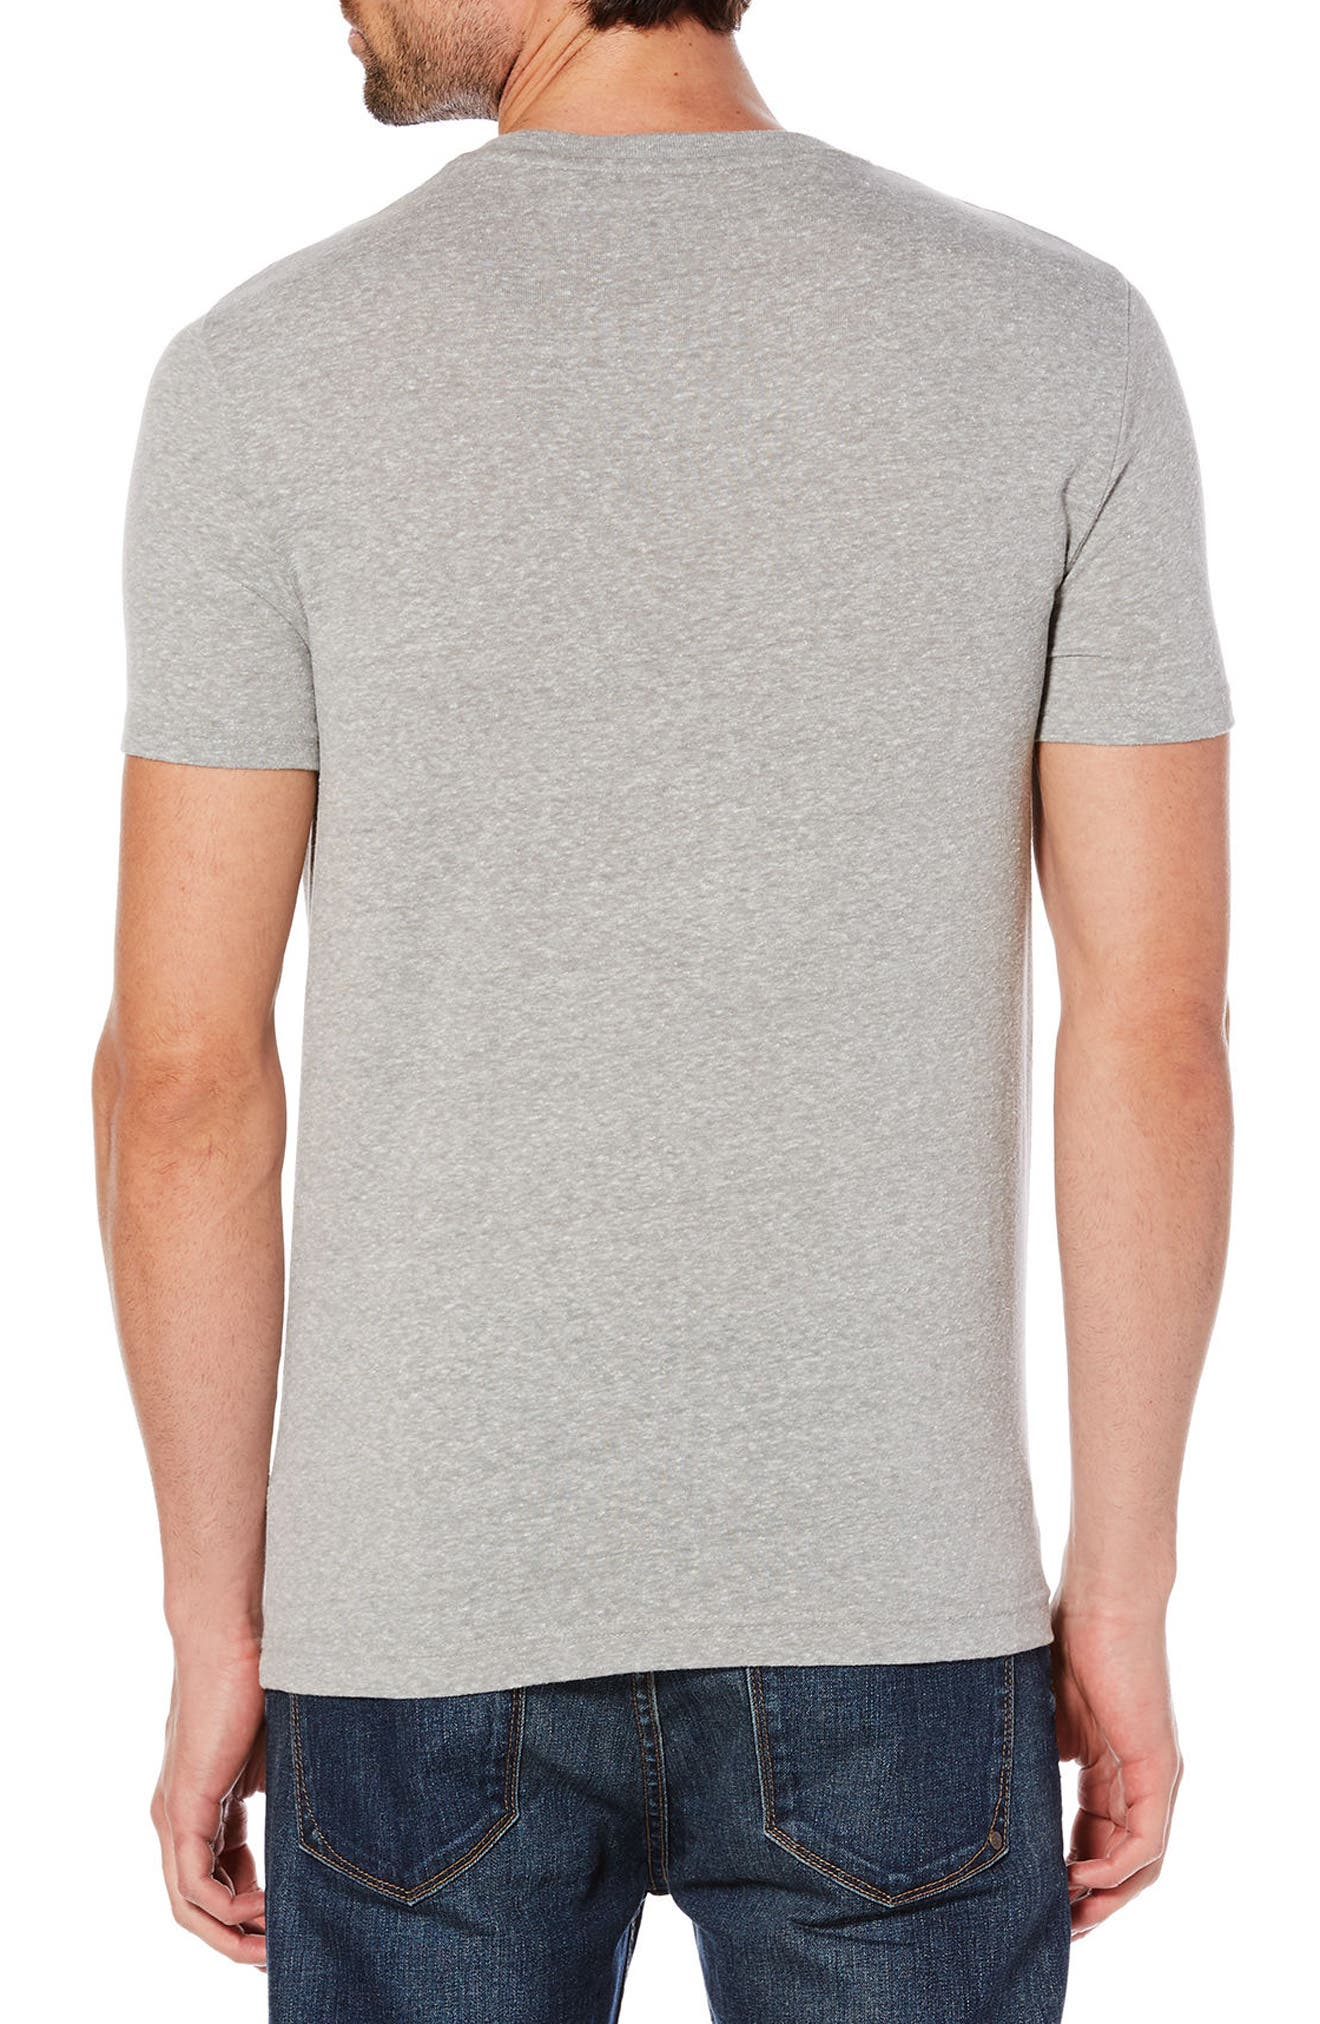 Engineered Stripe Pete T-Shirt,                             Alternate thumbnail 2, color,                             Rain Heather